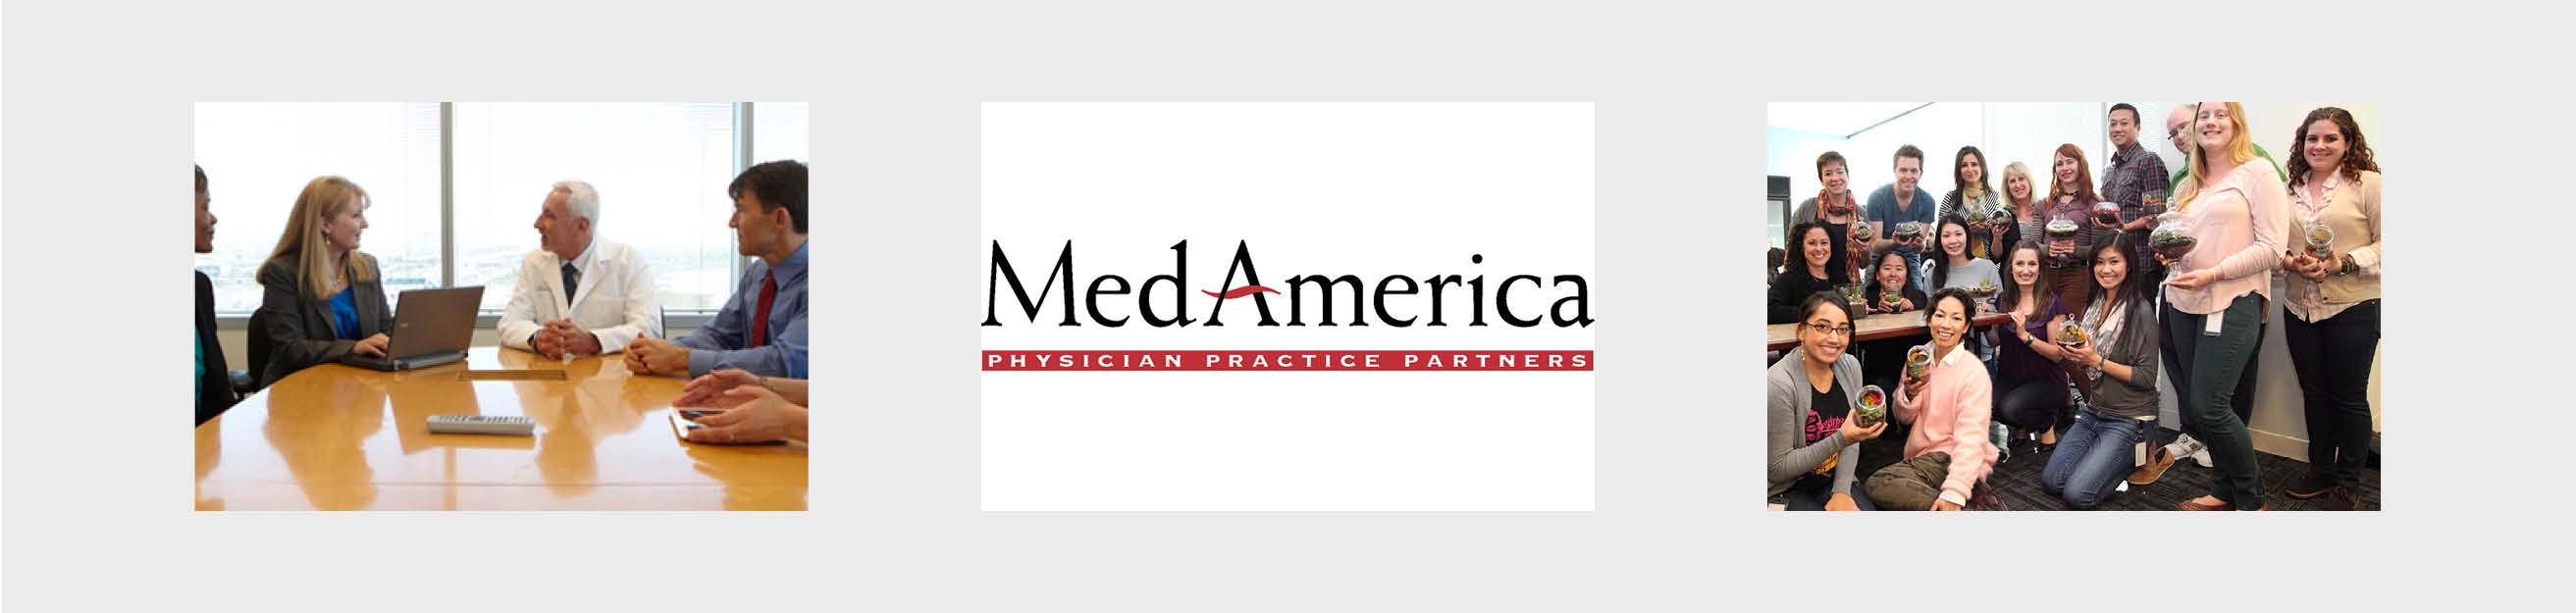 MedAmerica Images